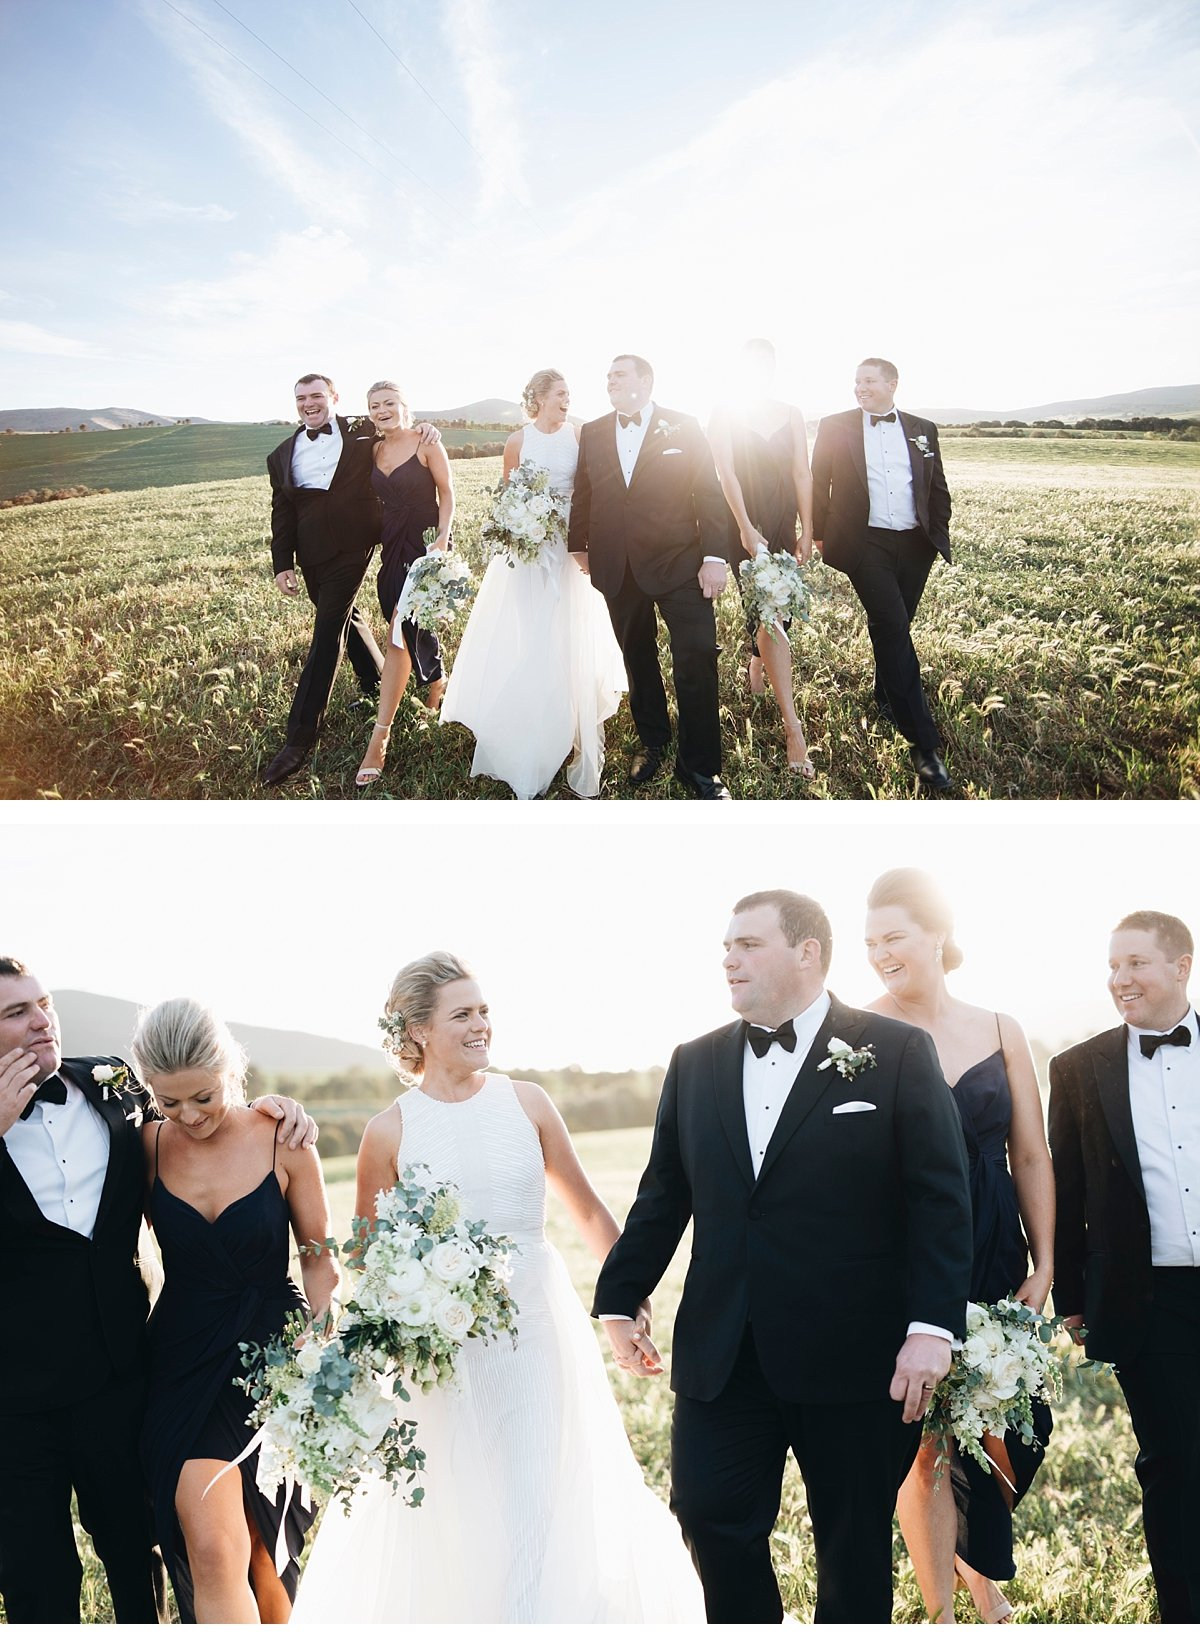 Wagga Wagga Wedding Photographer at Jugiong NSW_0535